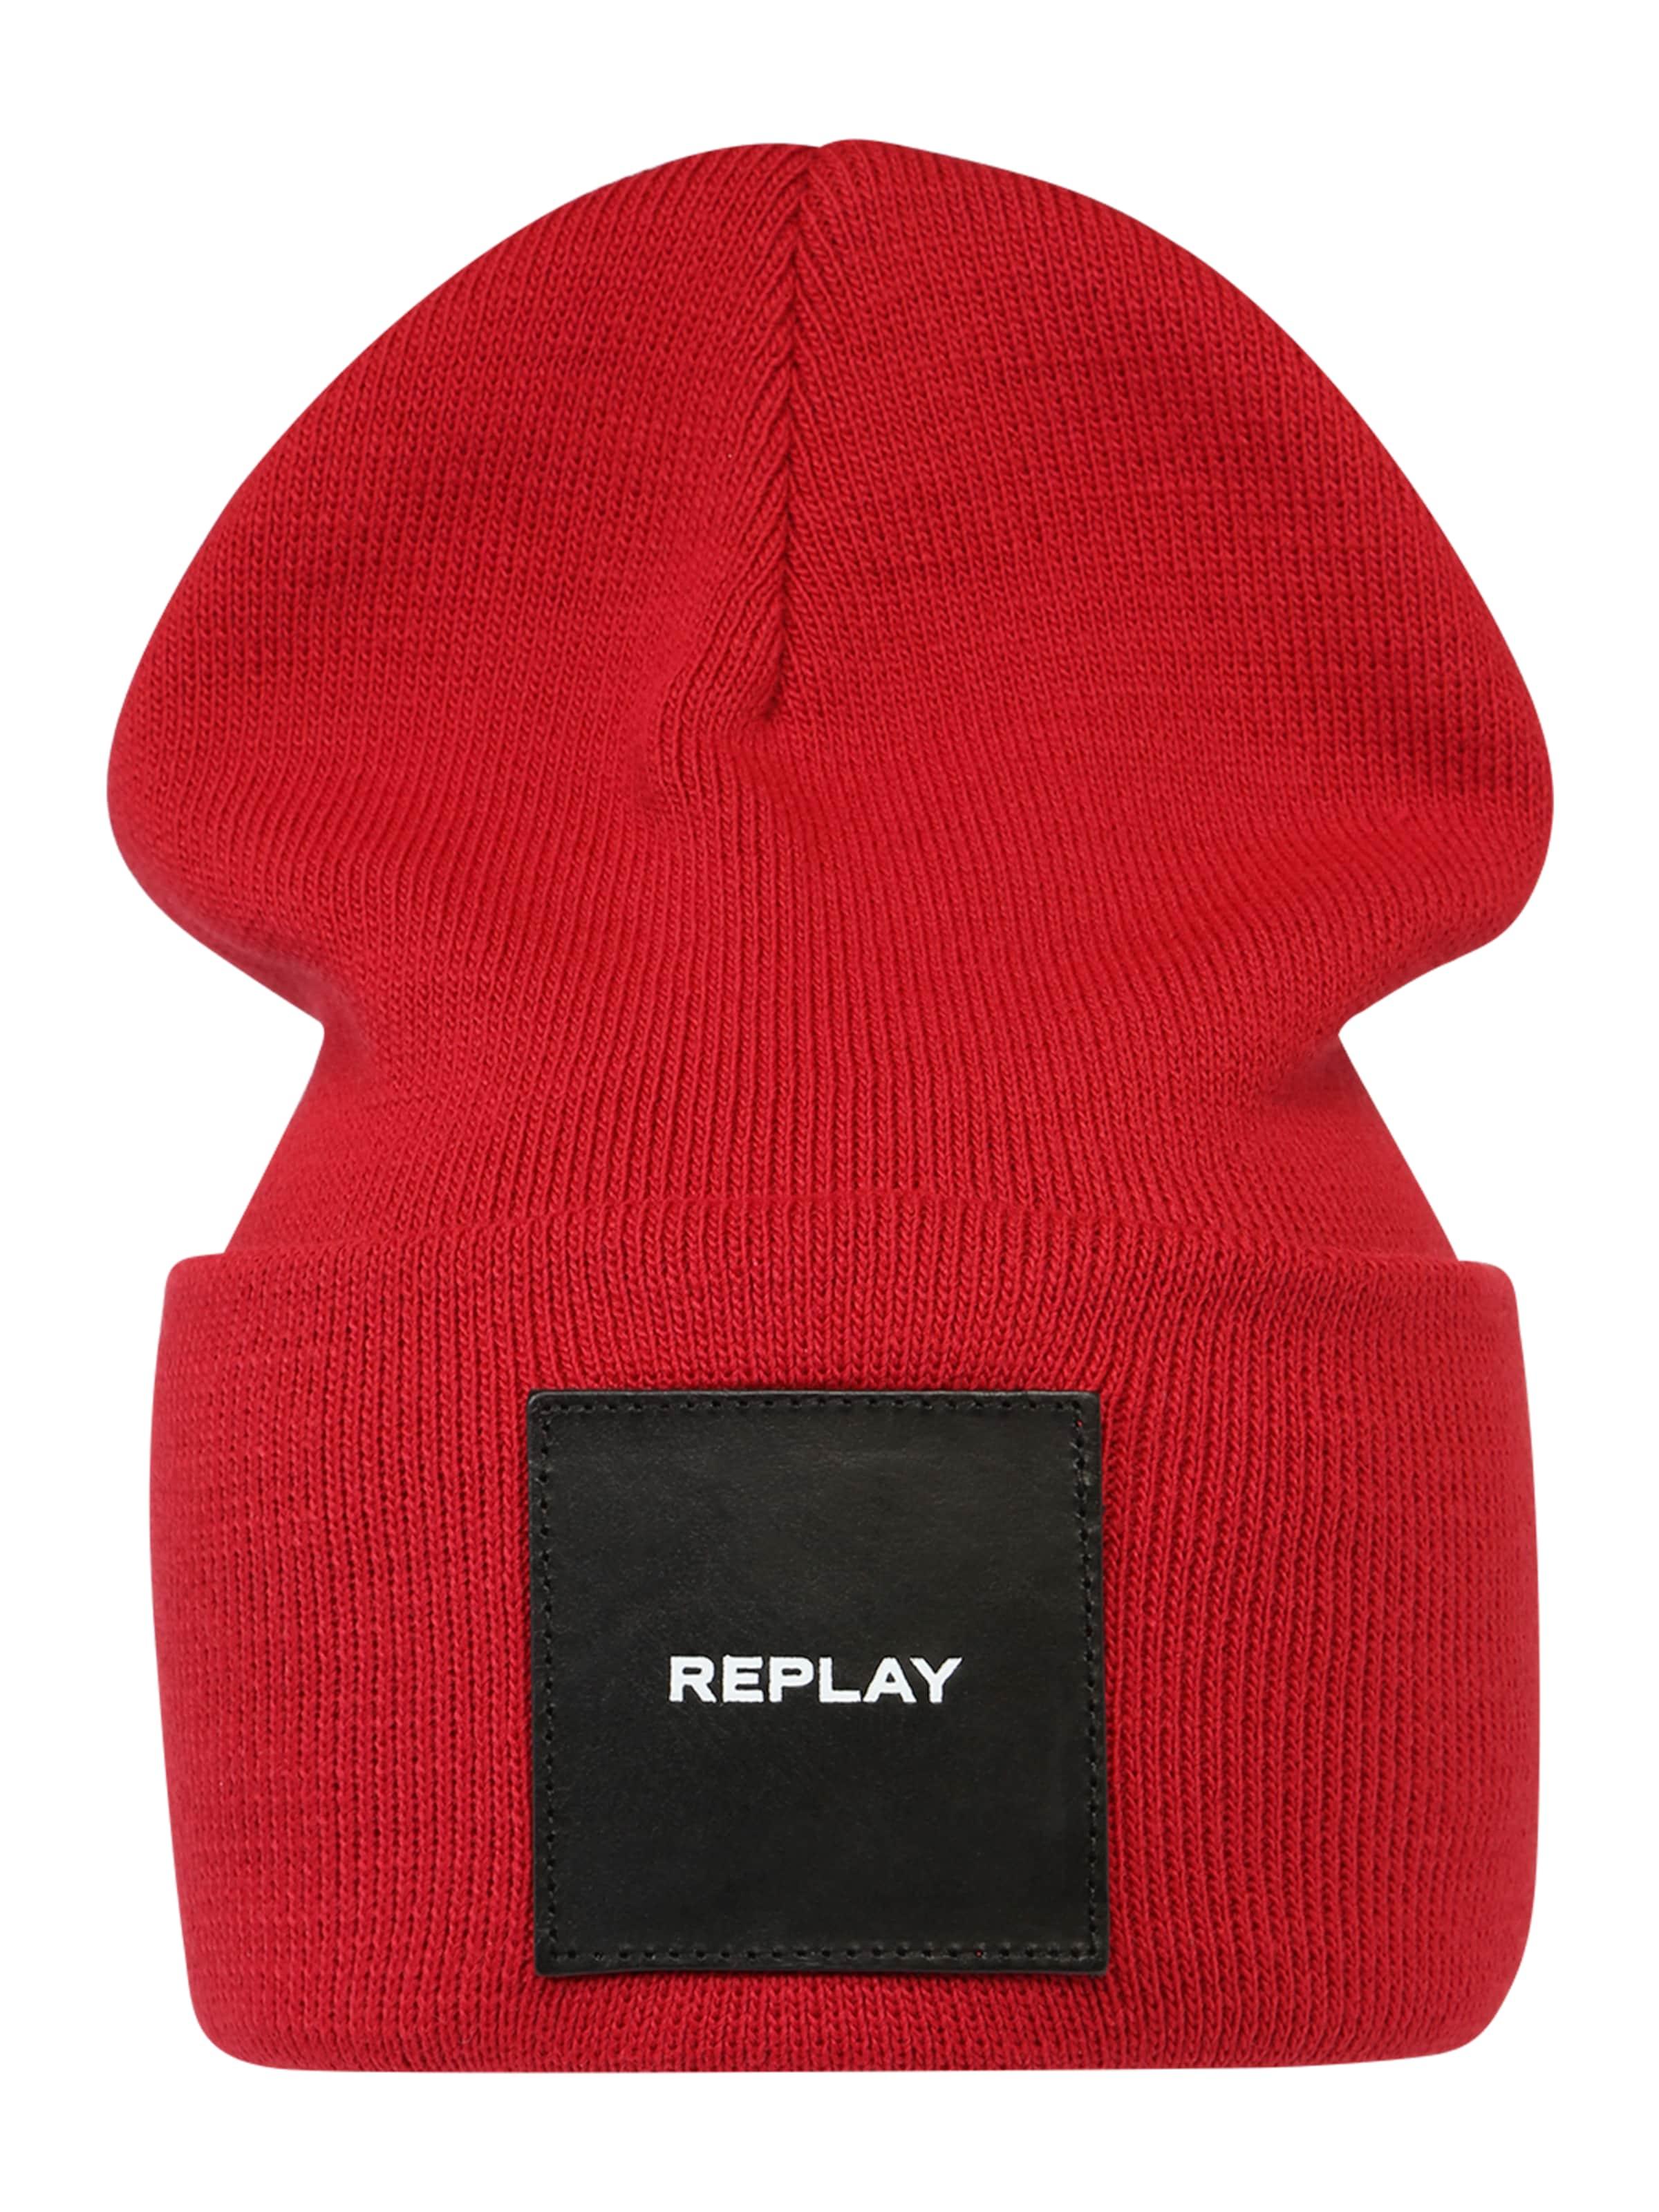 Mütze In Rot In Replay Replay Mütze hQCBsdtxro